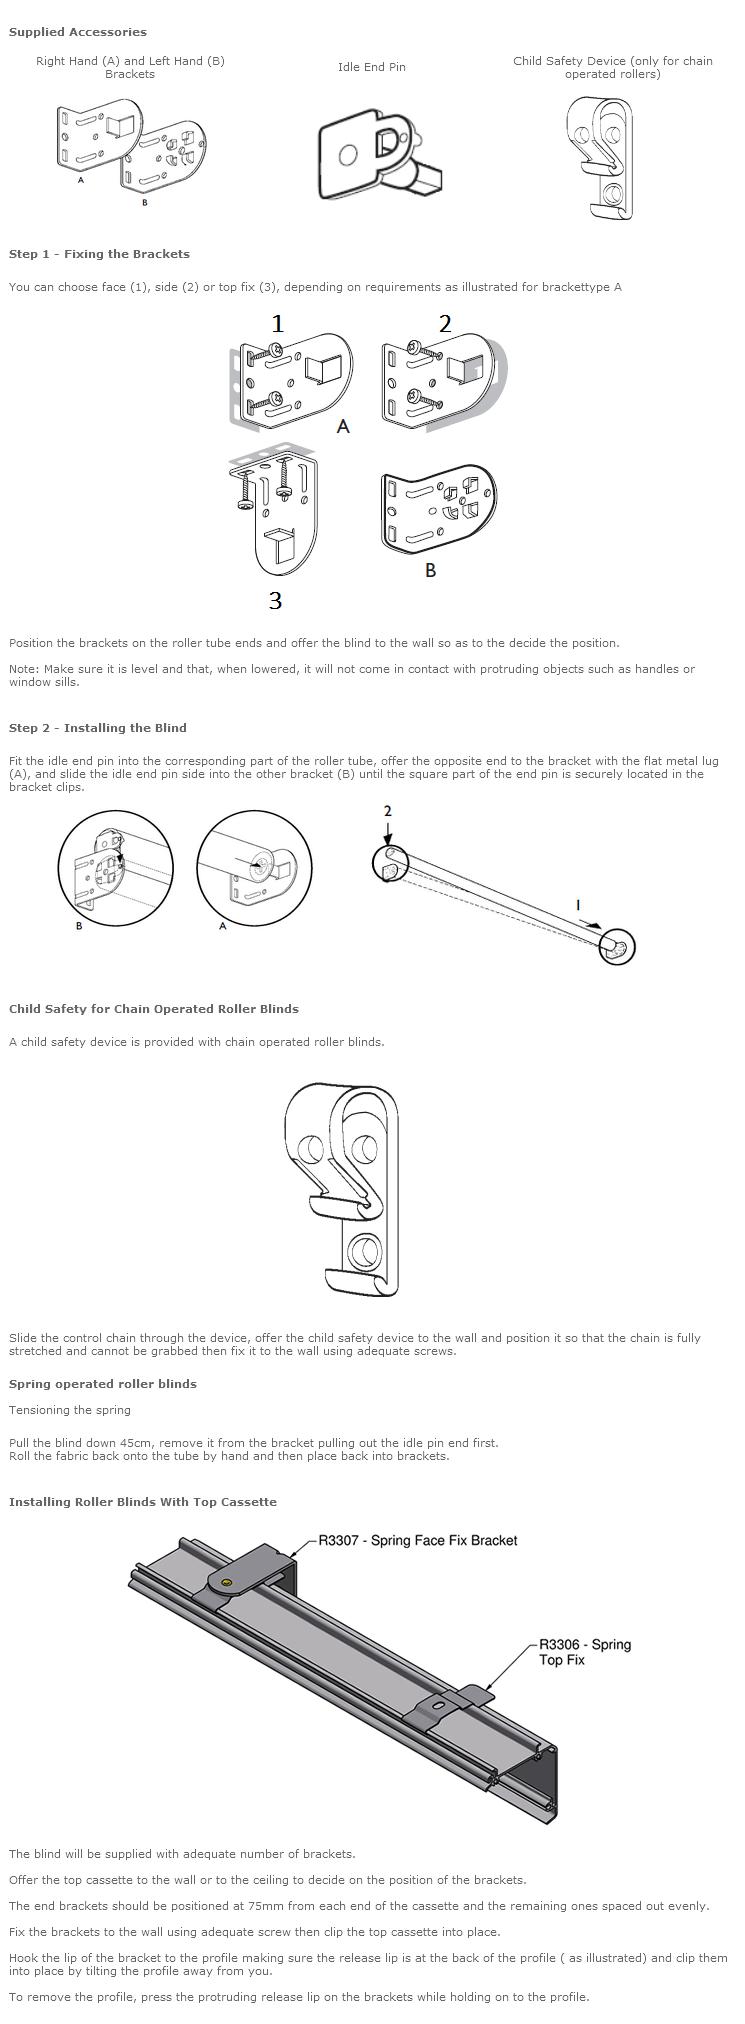 fitting guide for roller style blinds. Black Bedroom Furniture Sets. Home Design Ideas